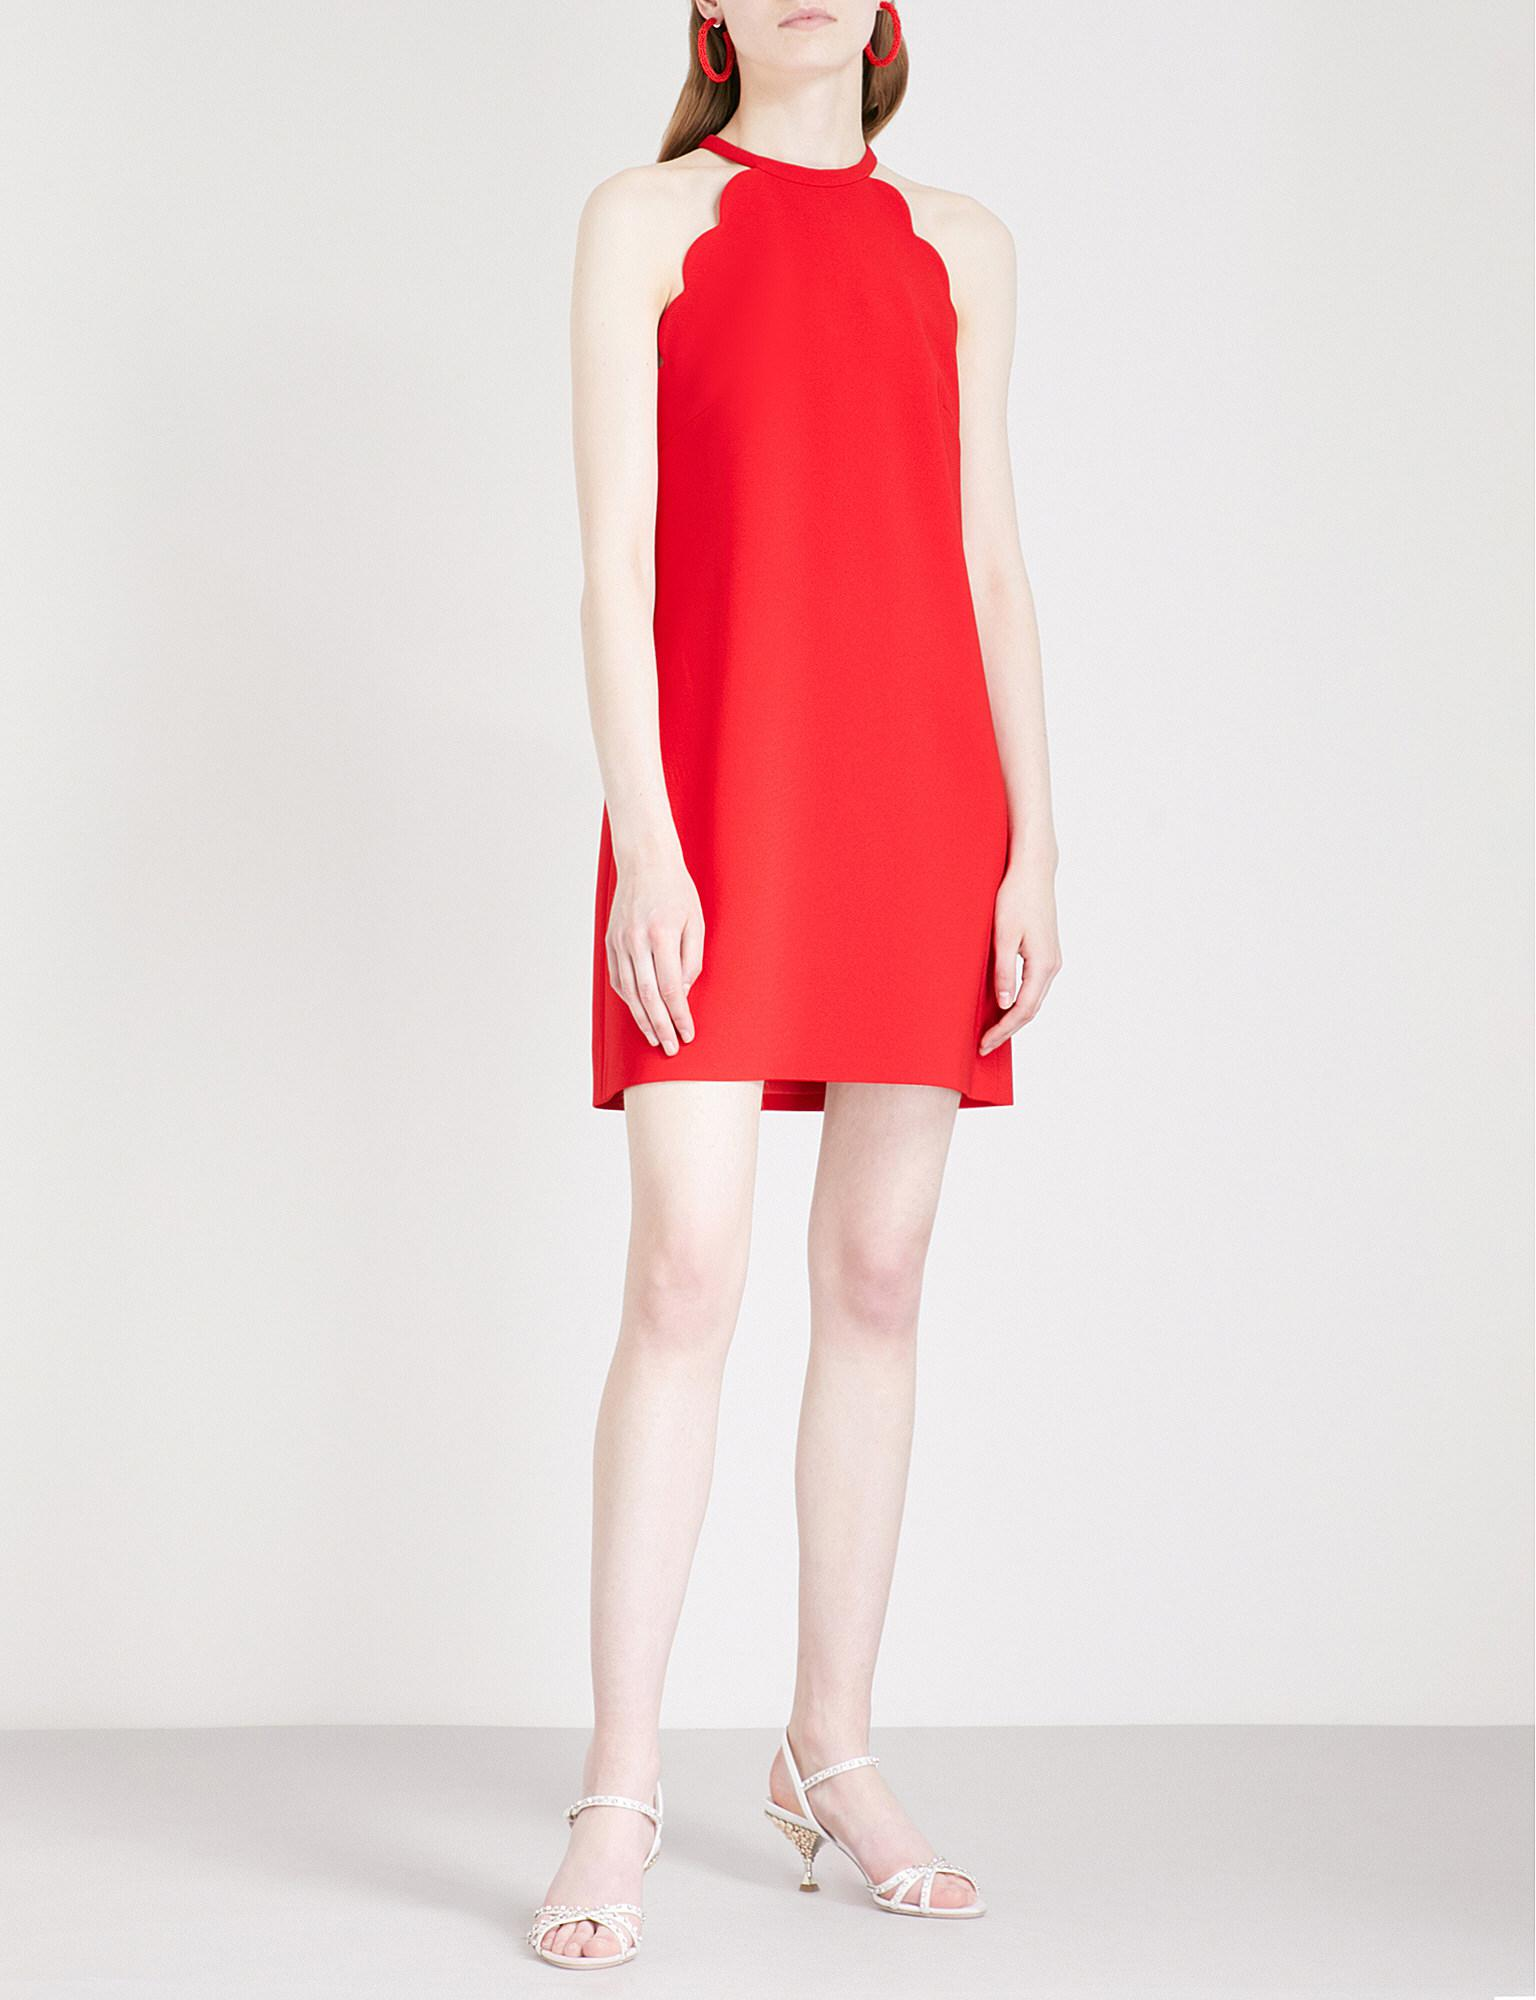 Lyst - Miu Miu Scalloped Halterneck Crepe Mini Dress in Red edac86fdd9557